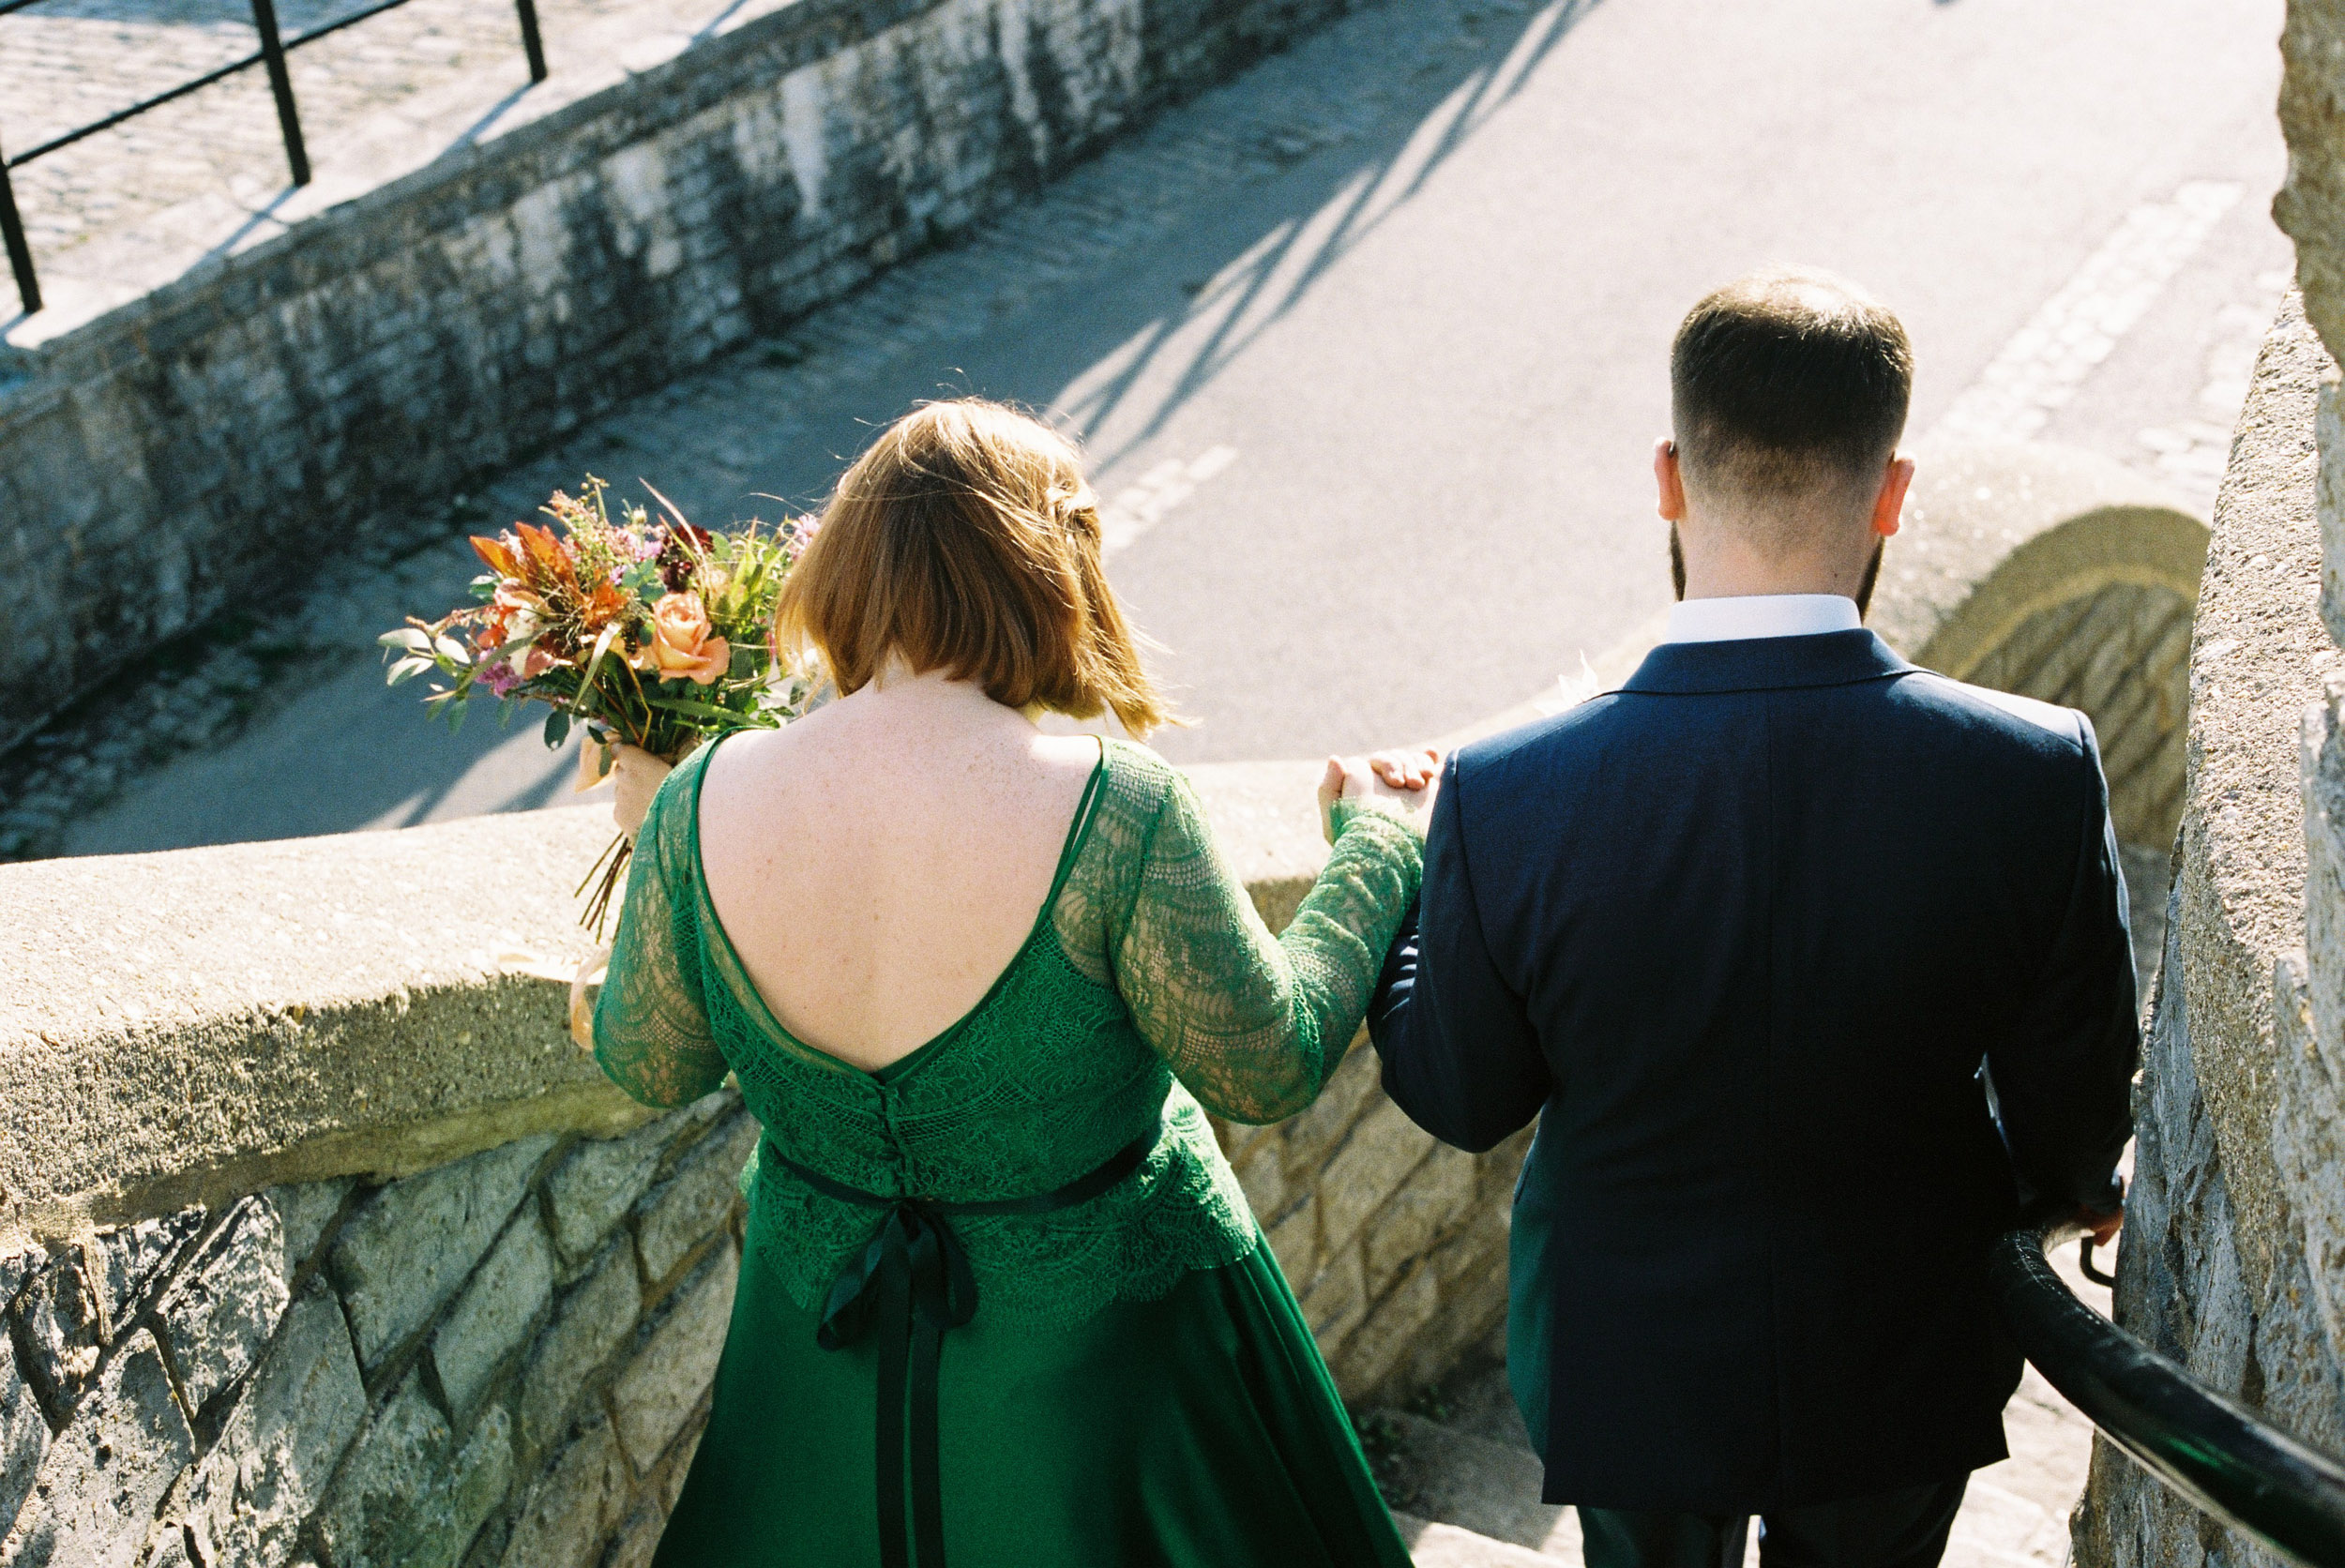 Lucy-Bespoke-Green-Silk-Lace-Wedding-Dress-Kate-Beaumont-Sheffield-13.jpg